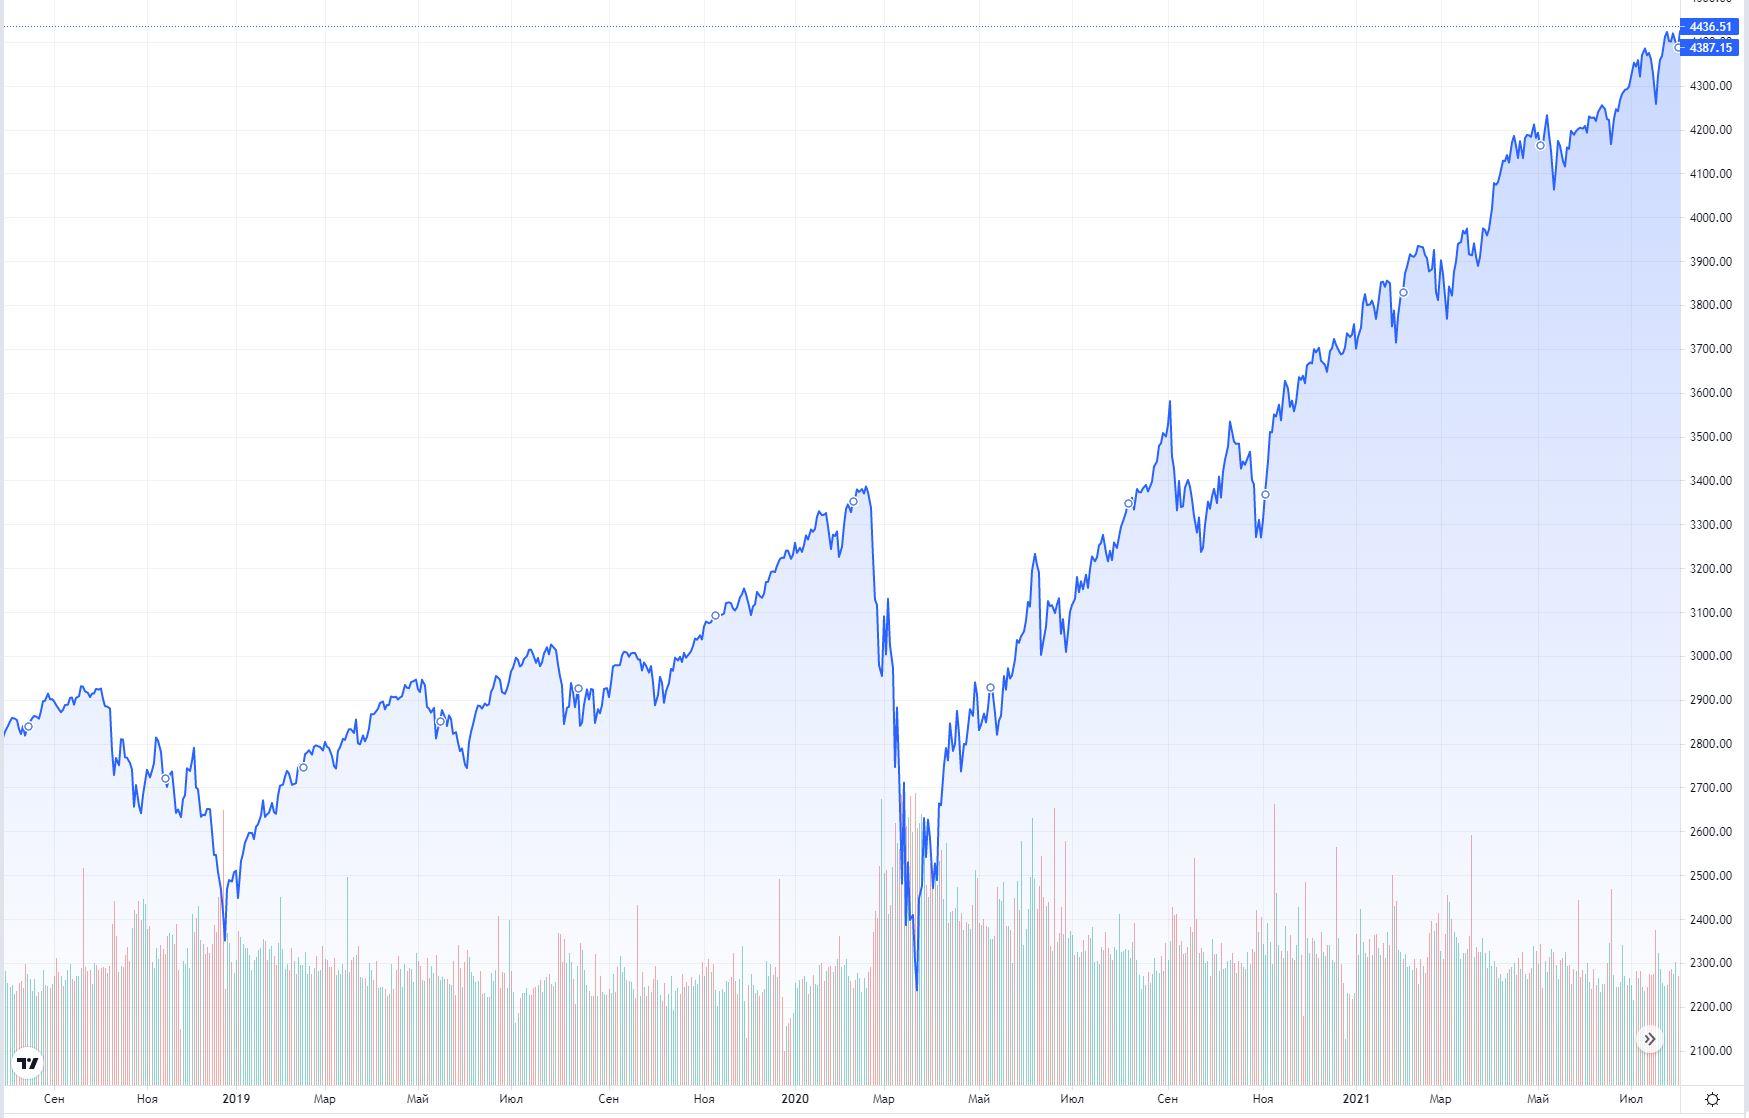 График S&P 500. Источник: https://ru.tradingview.com